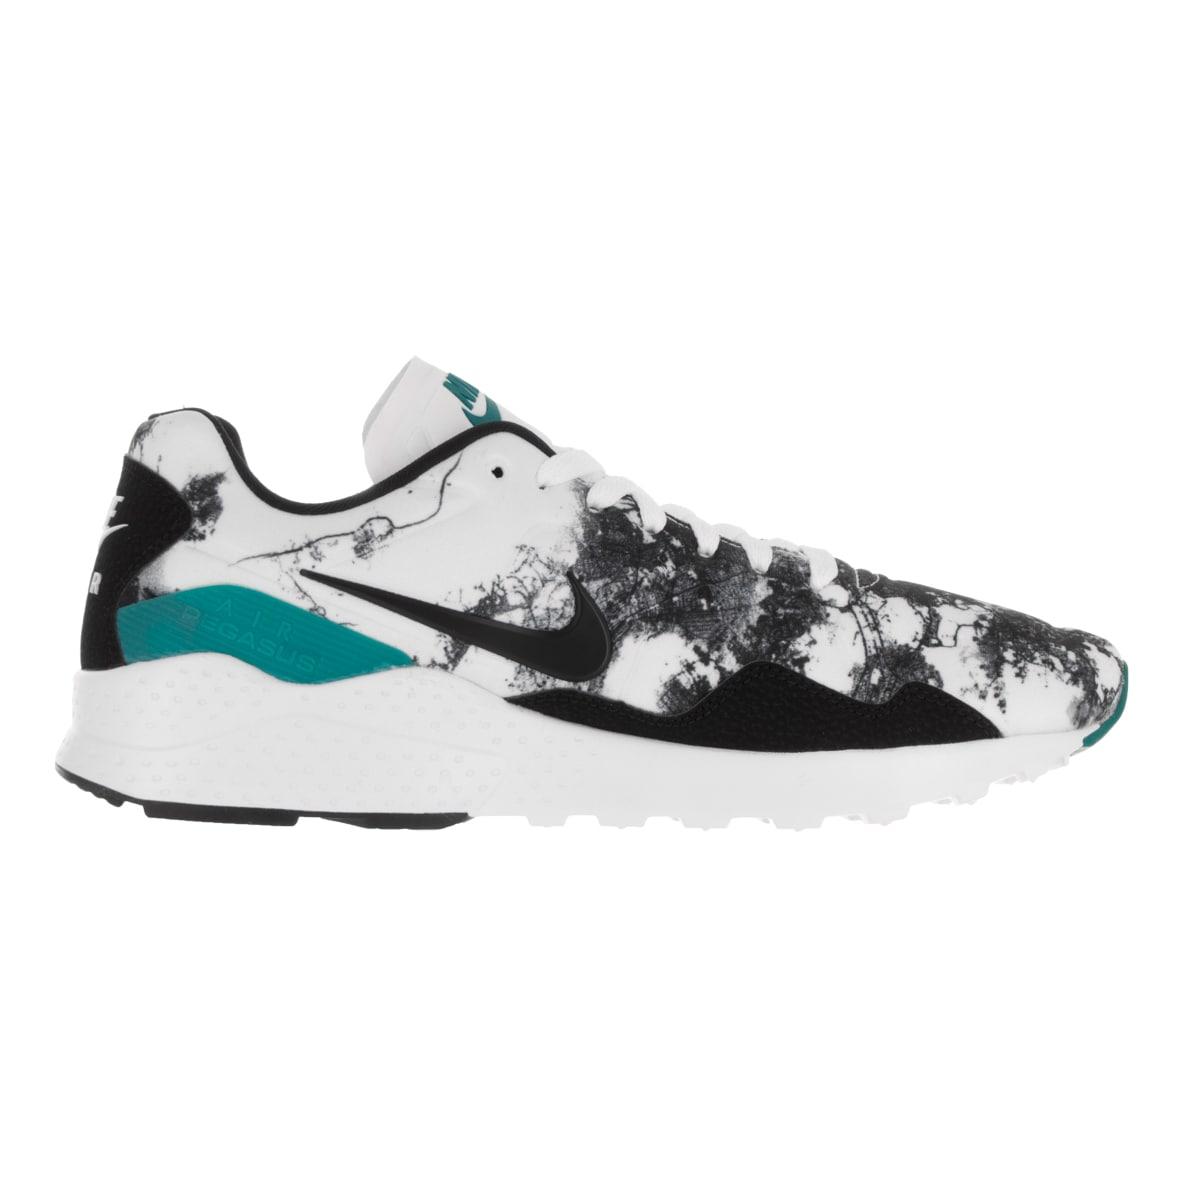 ea938b4faa87b Shop Nike Men's Air Zoom Pegasus 92 White, Black, Rio Teal Running Shoe -  Free Shipping Today - Overstock - 13404729